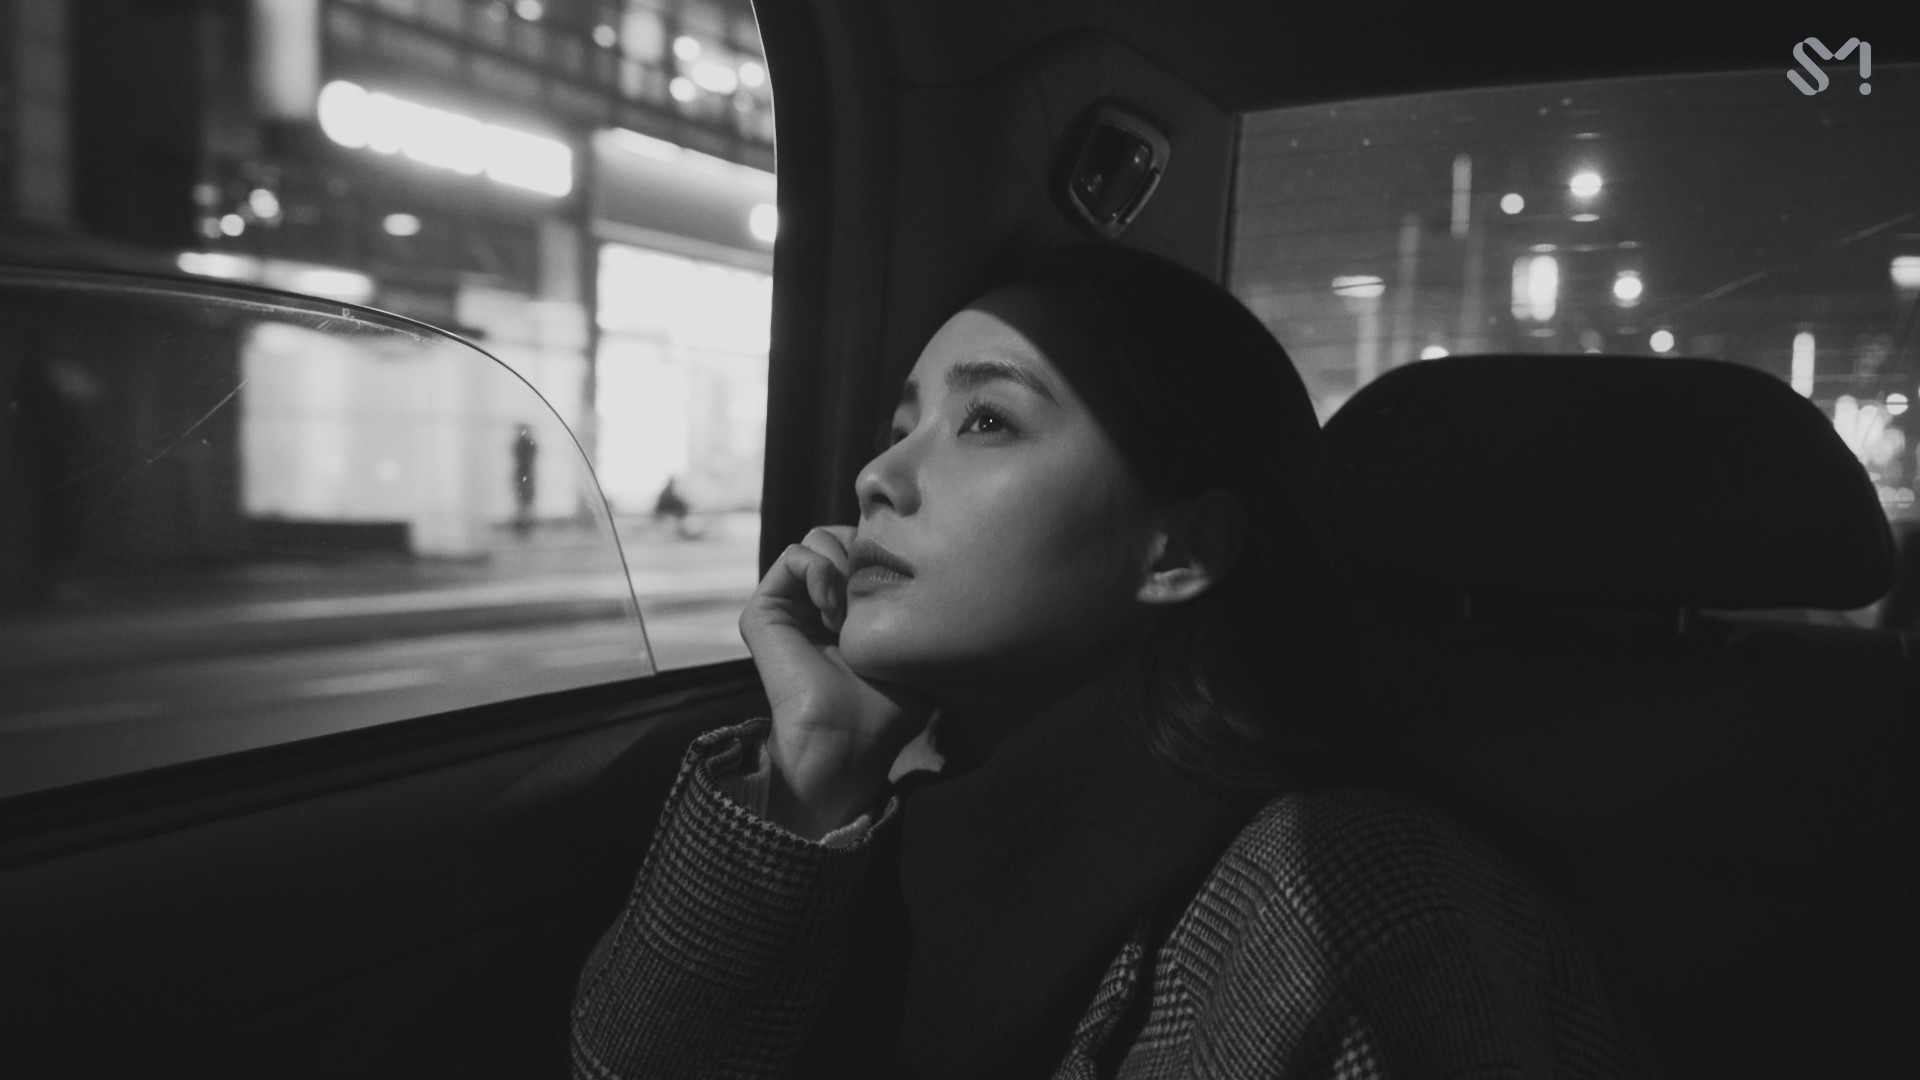 [STATION 3] Colde 콜드 '상실 (Loss)' MV